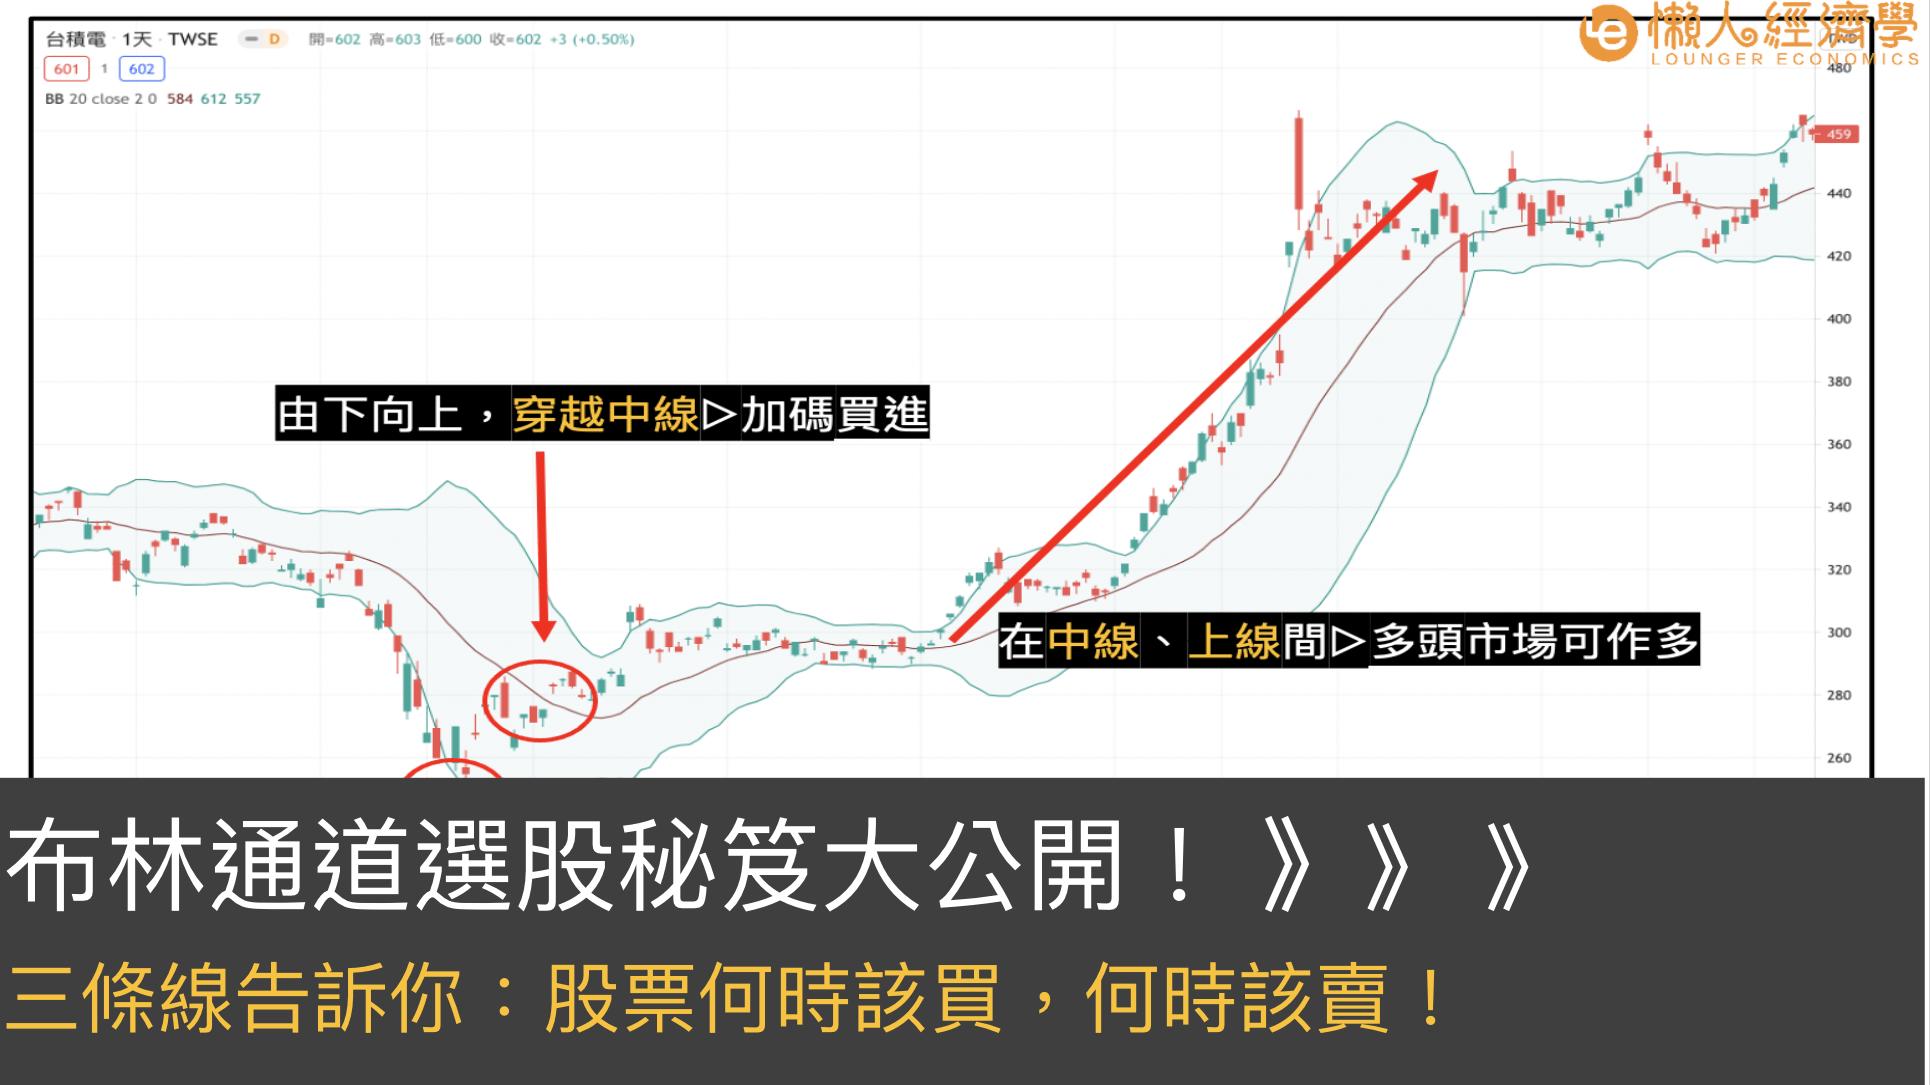 布林通道選股 stock analysis